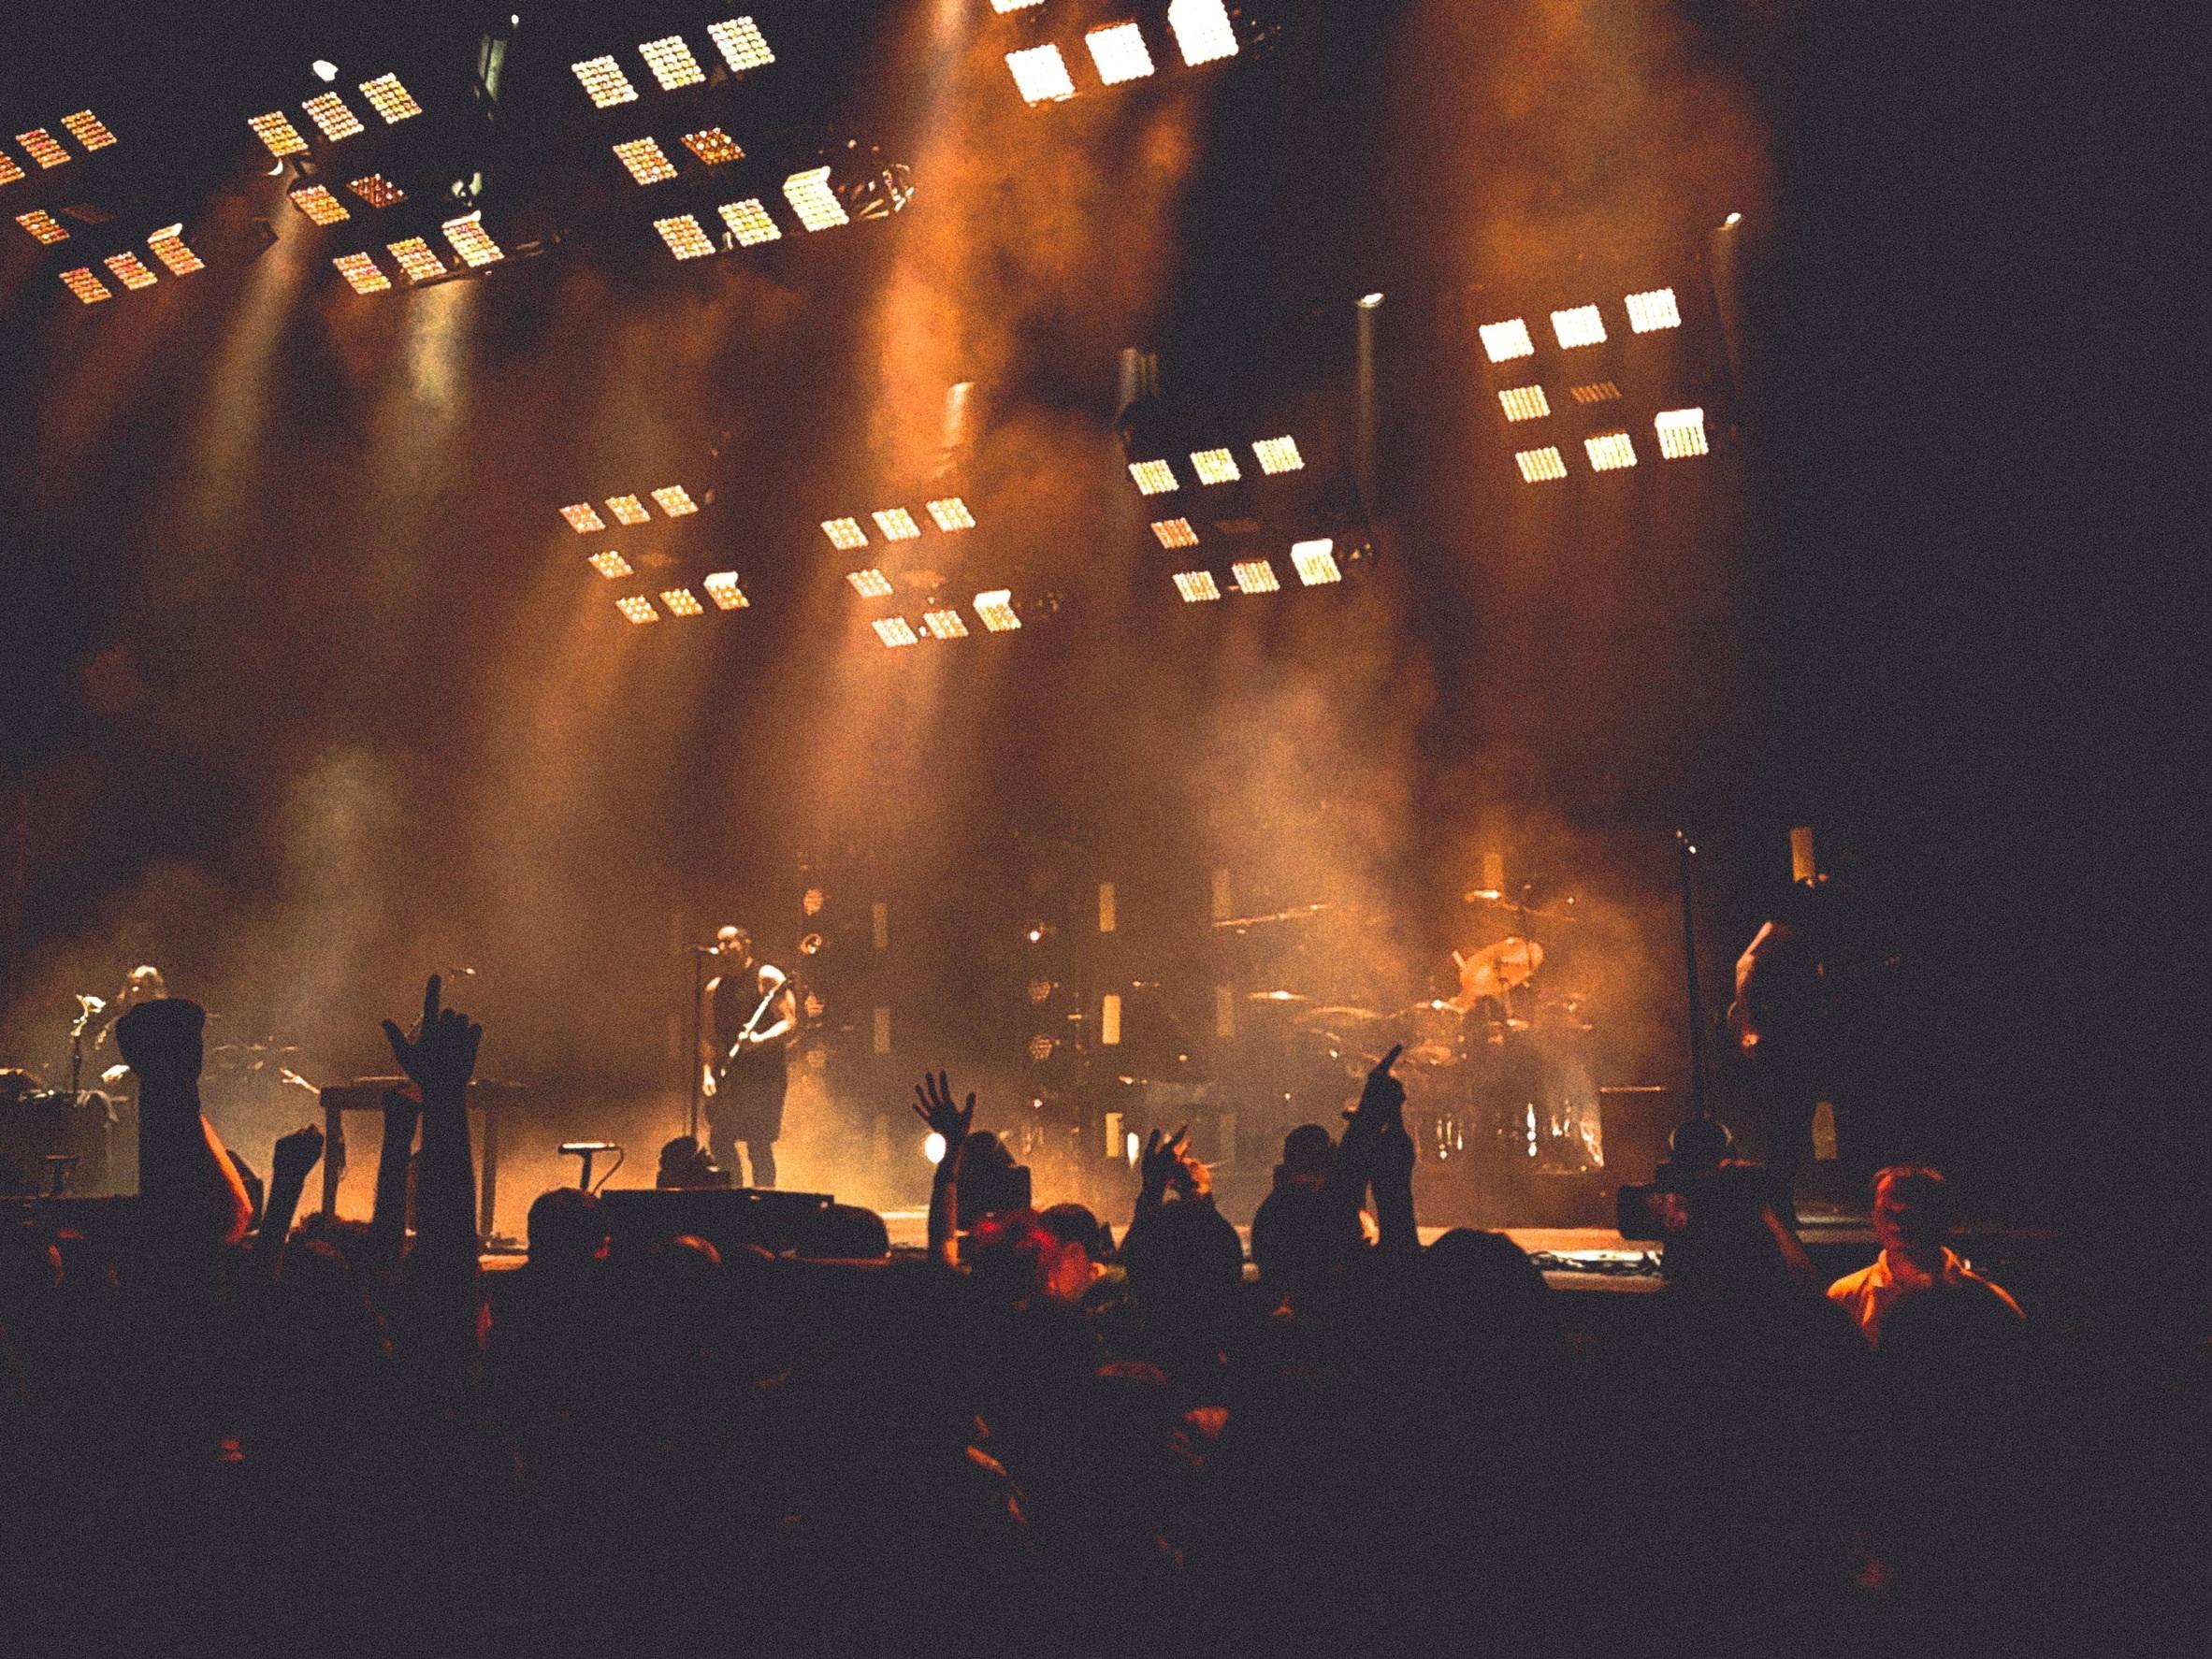 Free Images : music, people, smoke, crowd, dark, band ... - photo#18